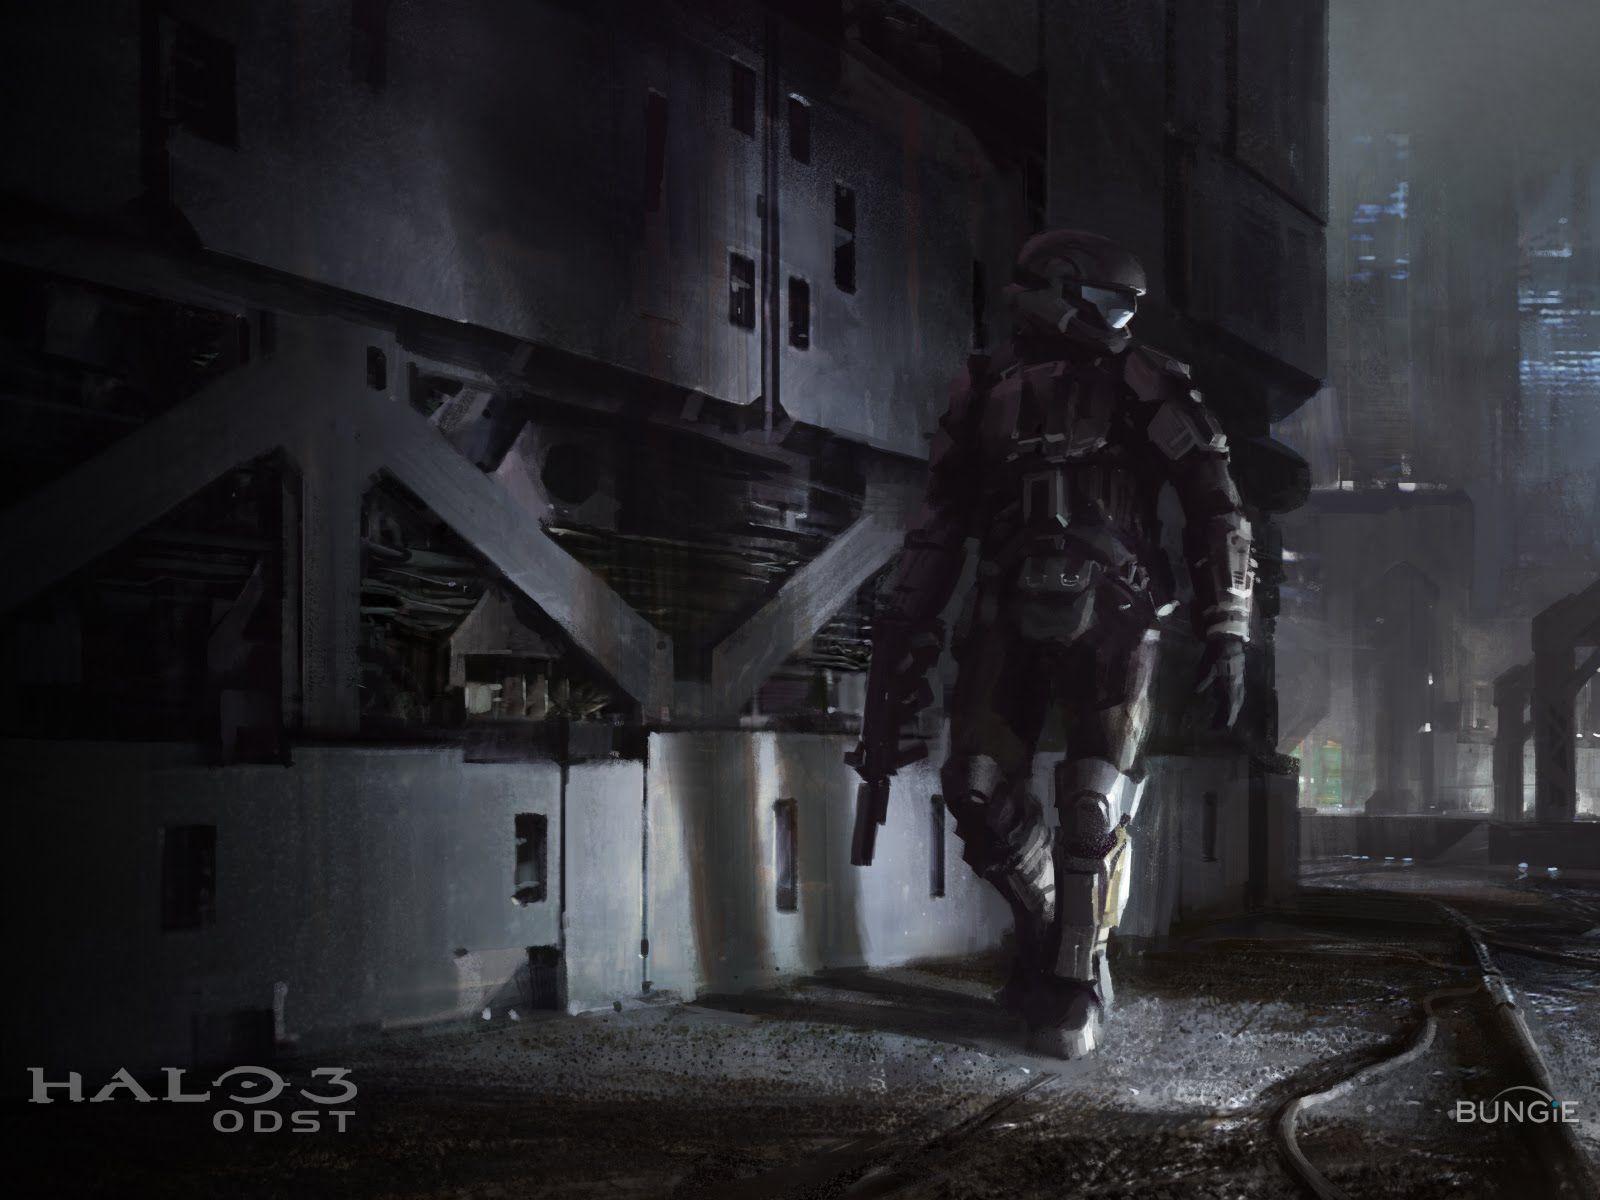 Halo Odst Odst Halo Arte Conceptual Video Juego